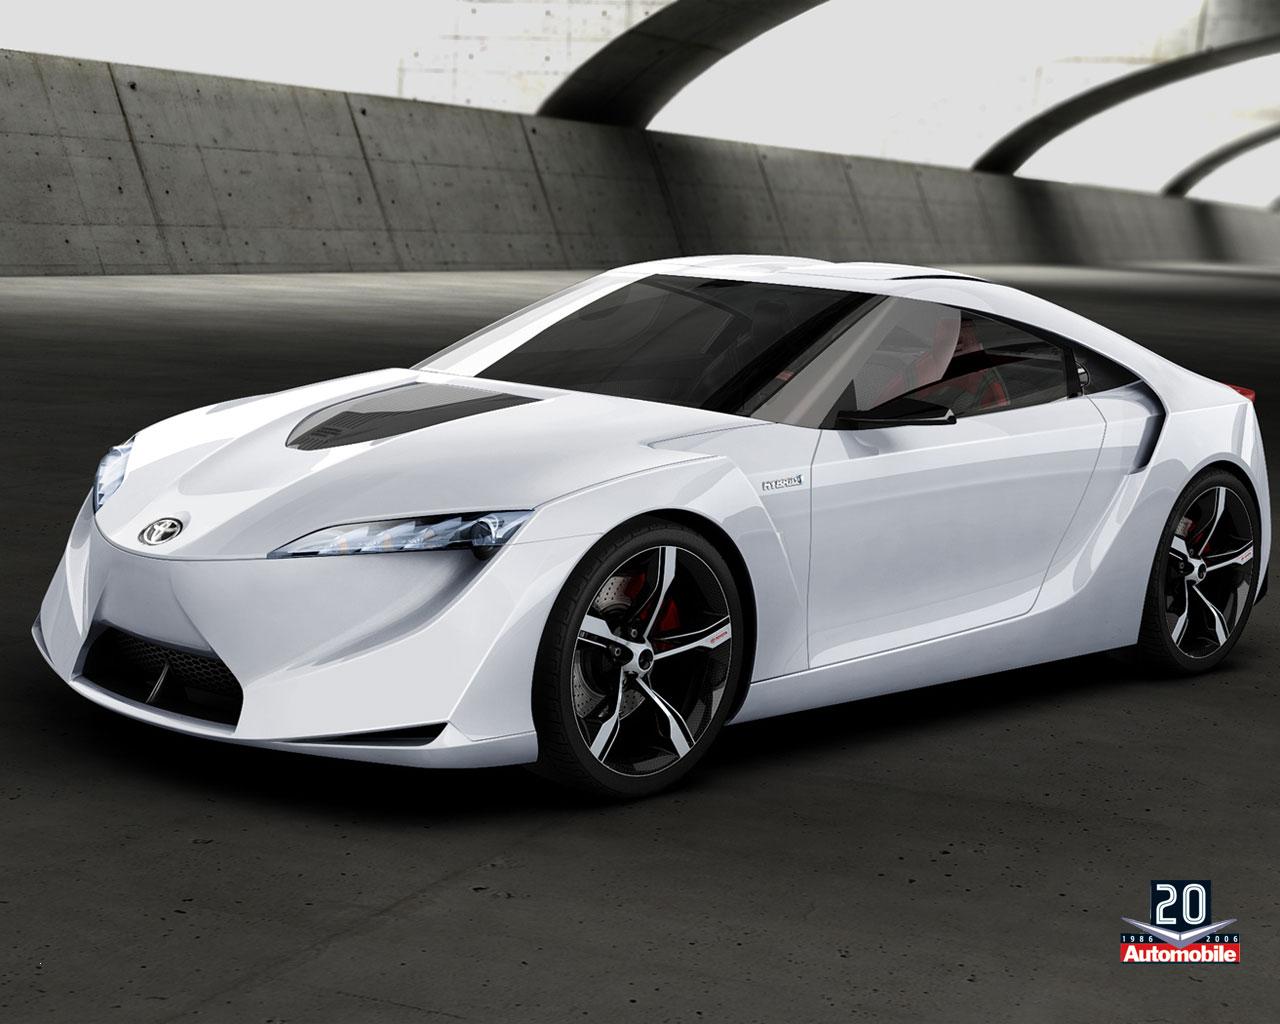 http://1.bp.blogspot.com/_qKAj9ZRMD9k/TTrngCfsN3I/AAAAAAAAAiY/FQuxYvLVXg0/s1600/Toyota%20Car%20Wallpapers%20%286%29.jpg